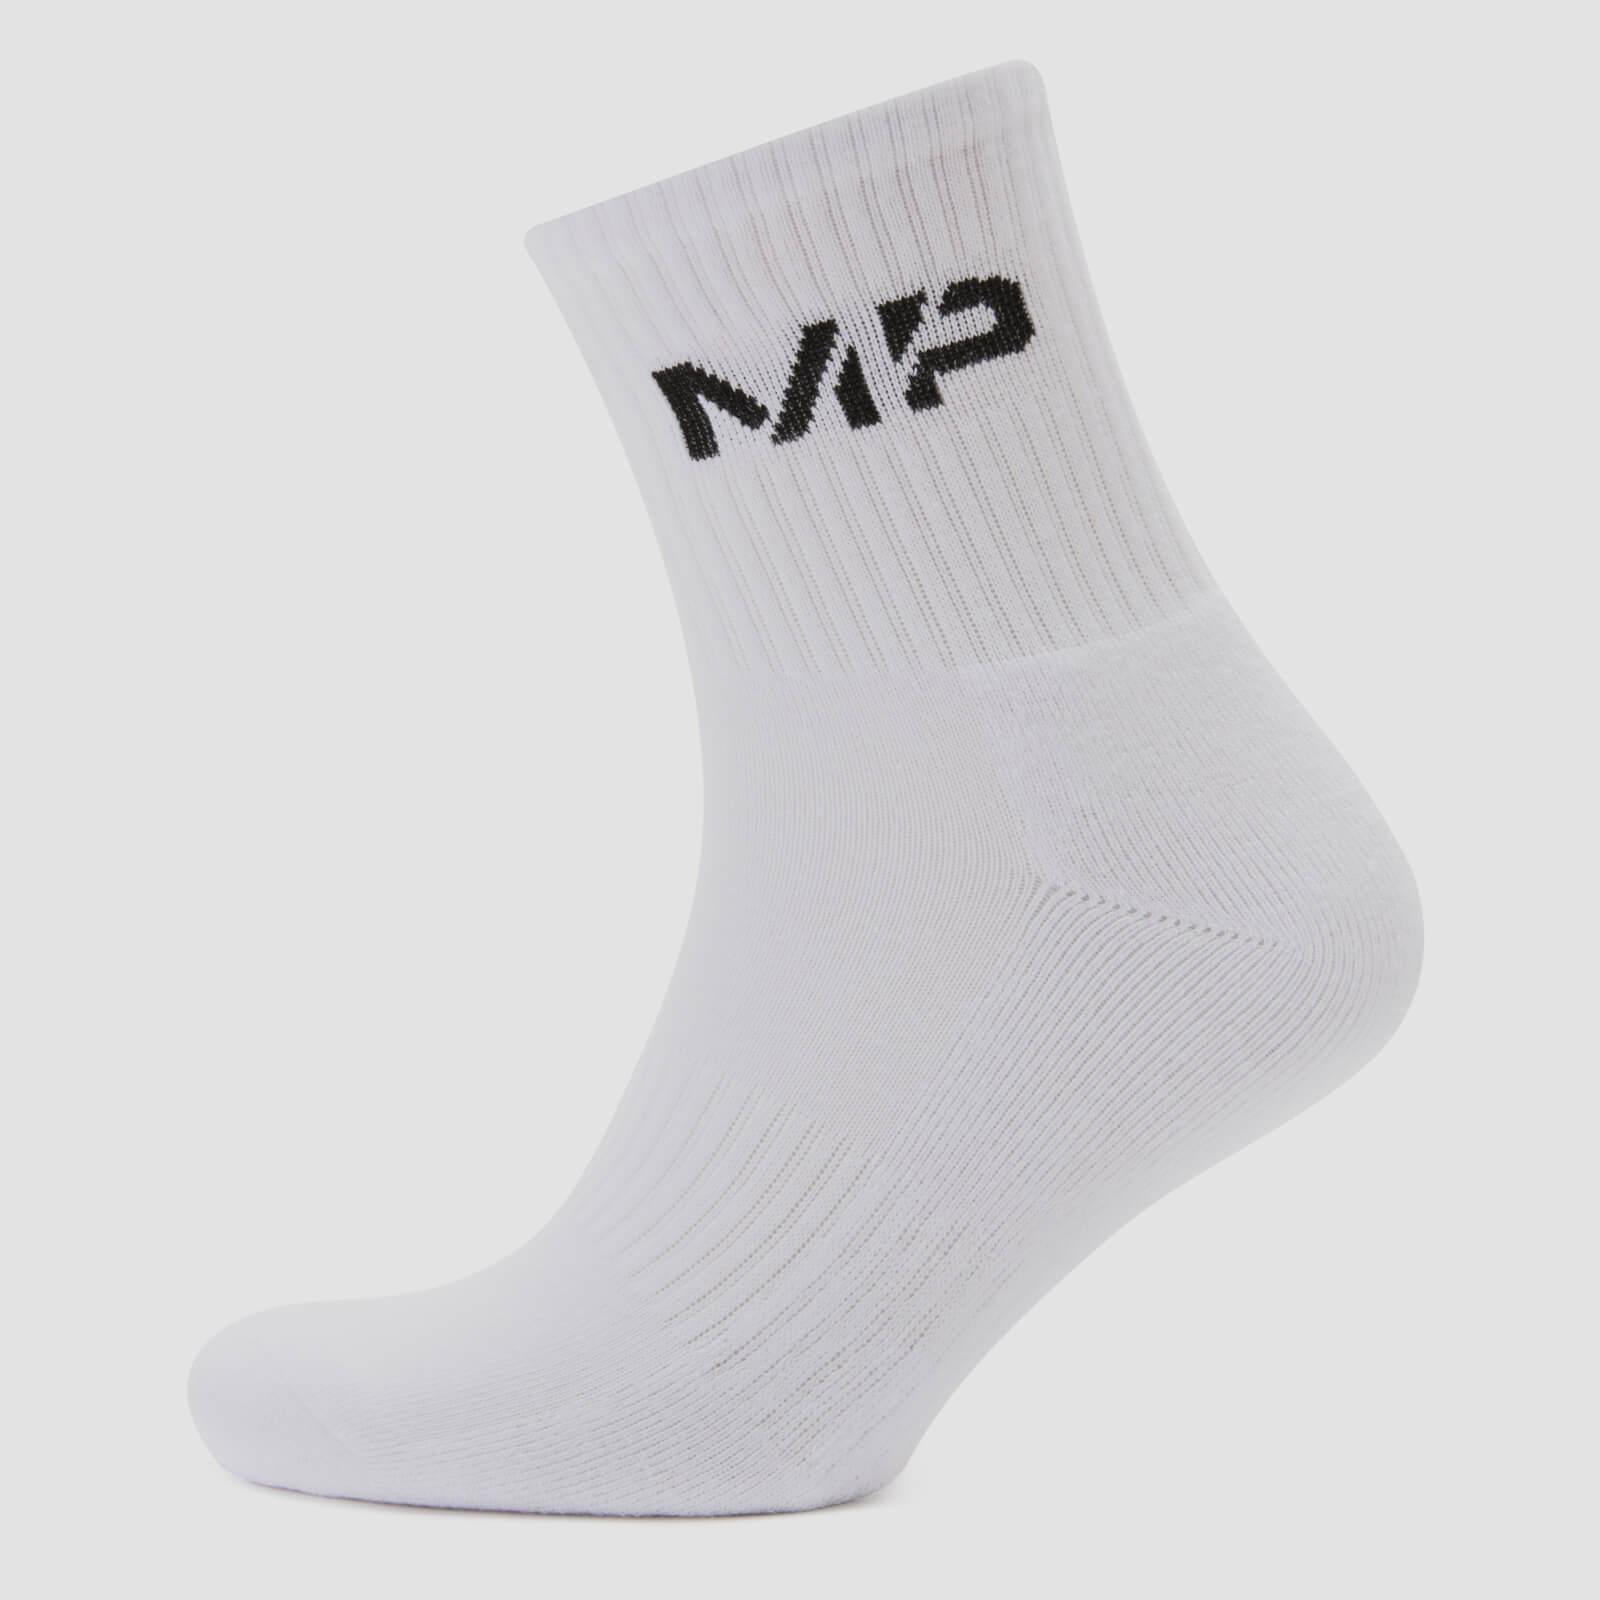 Reebok UFC Crew Sock White: Amazon.co.uk: Sports & Outdoors